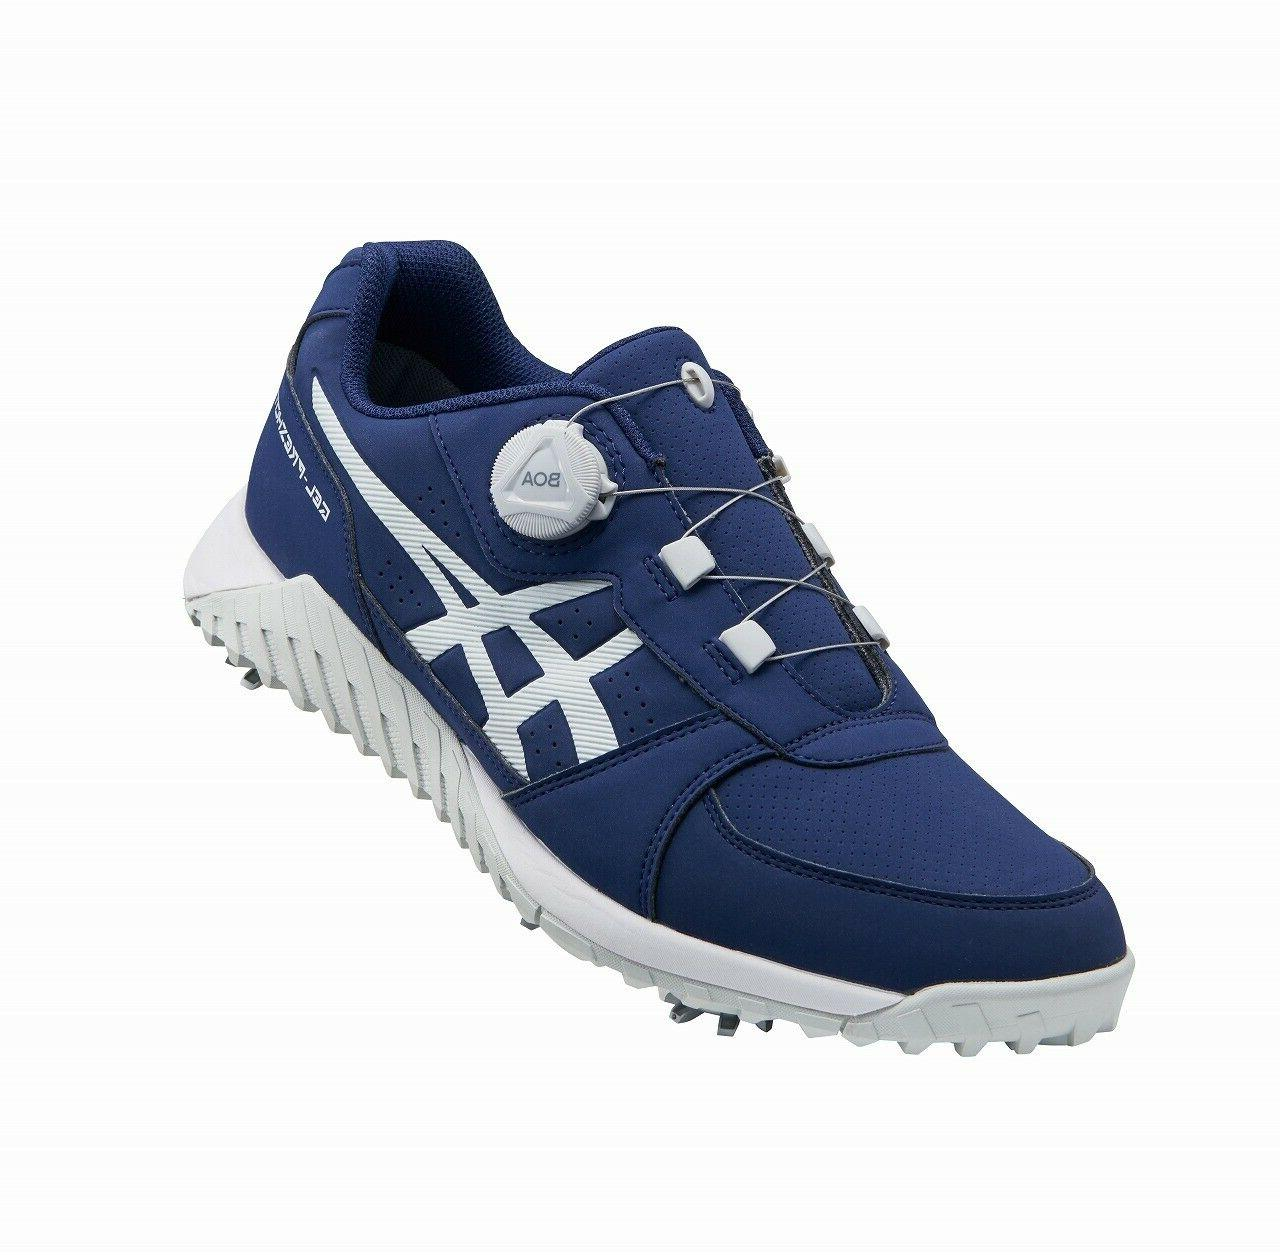 japan golf shoes gel preshot boa soft